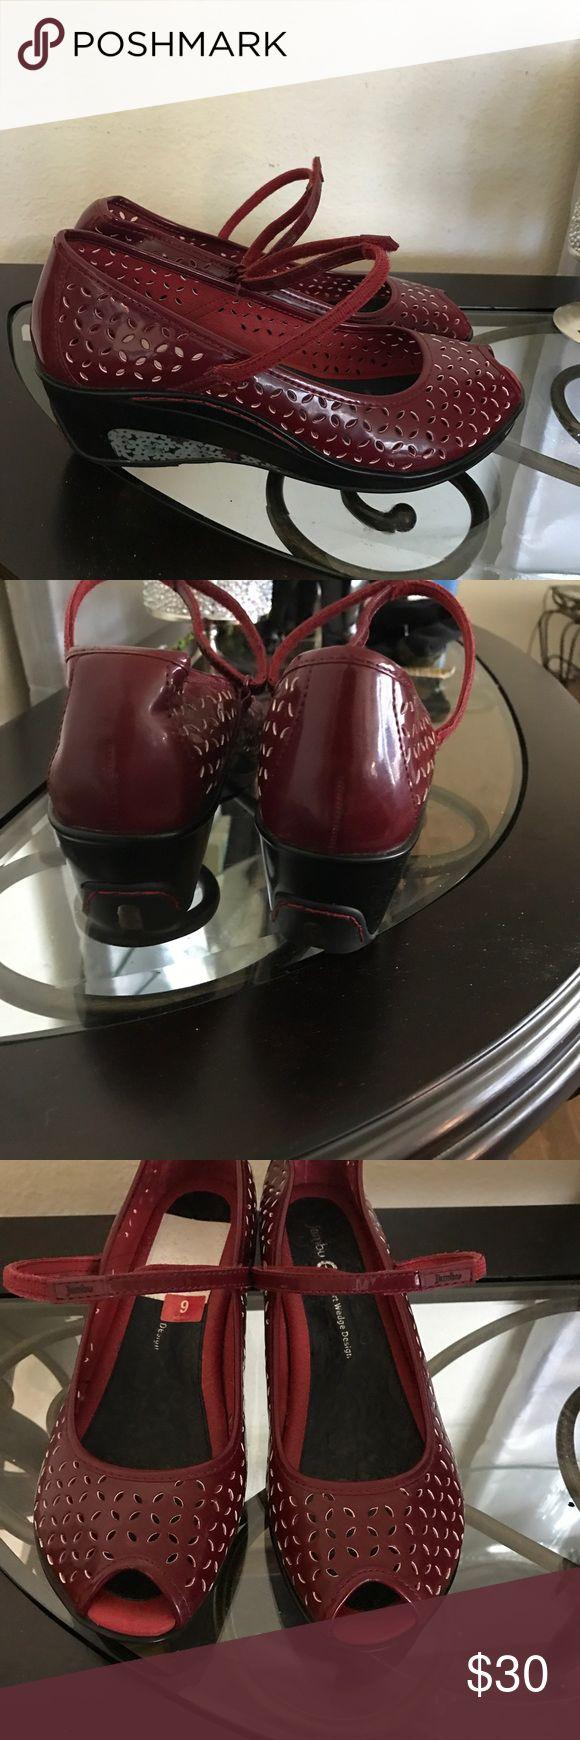 Ladies shoes Jambi shoes are comfortable Jambu Shoes Mules & Clogs